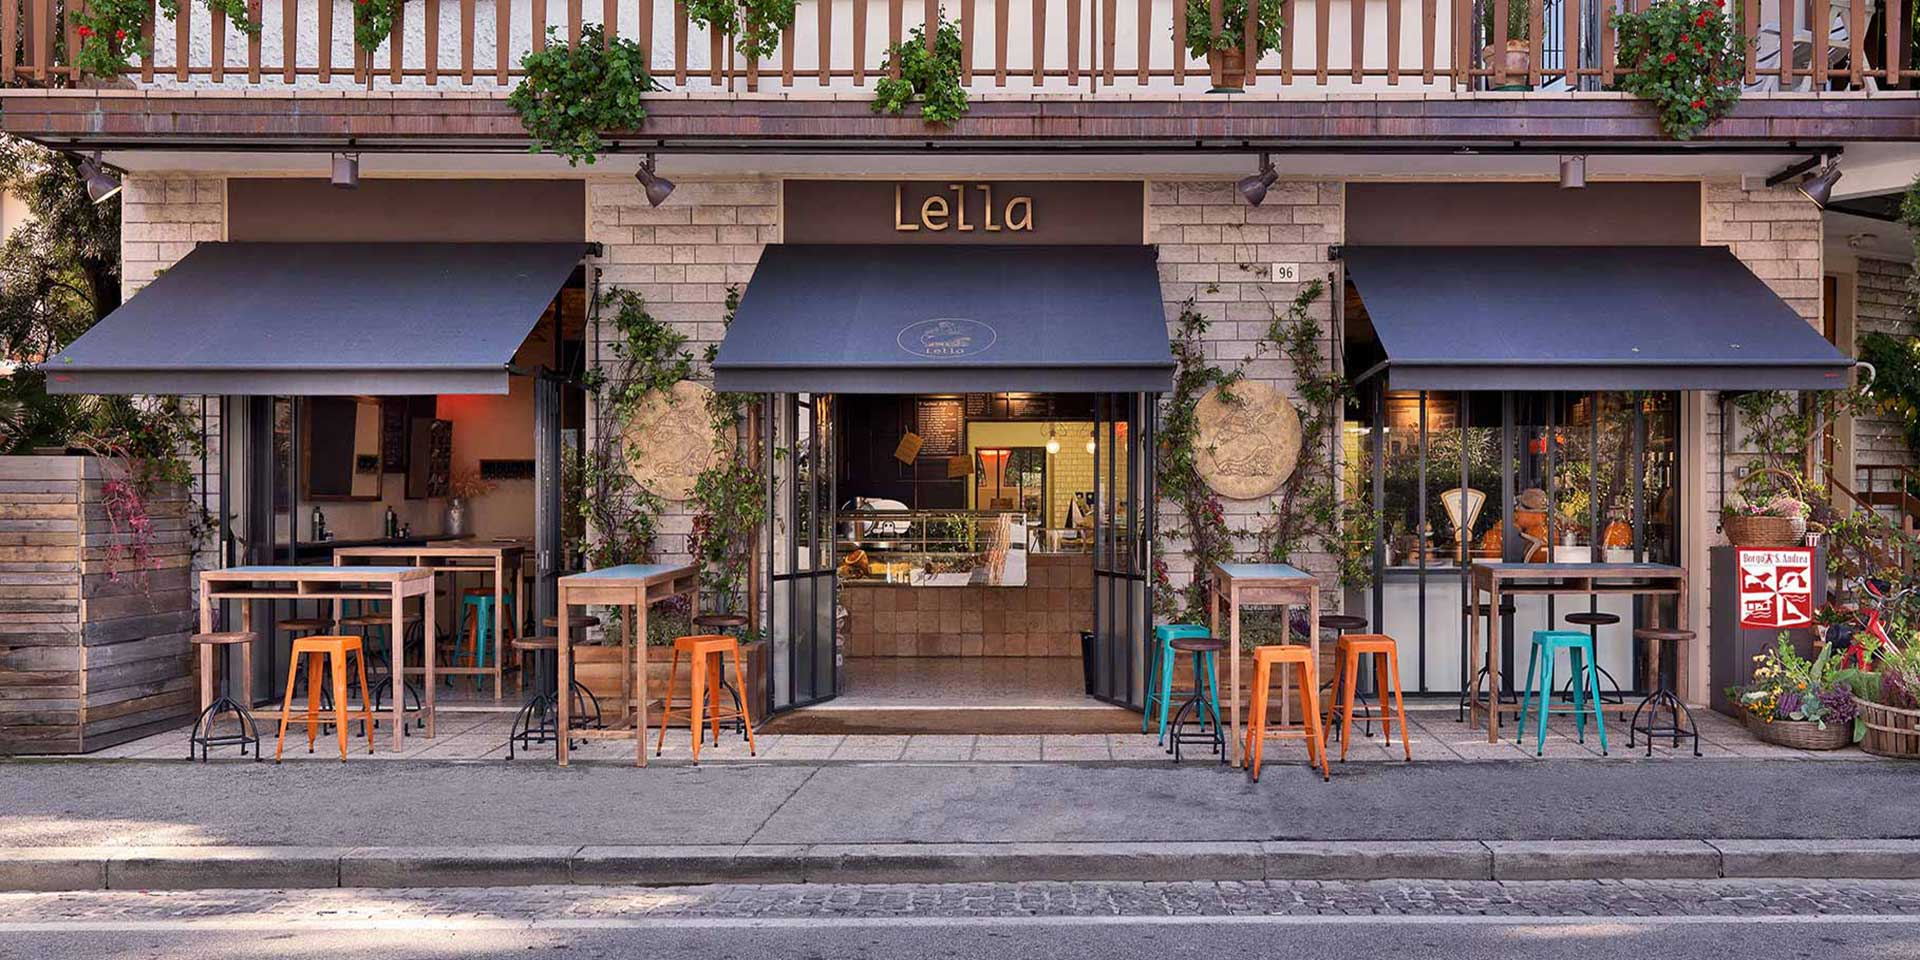 archinow_LEL_street-food-store_01